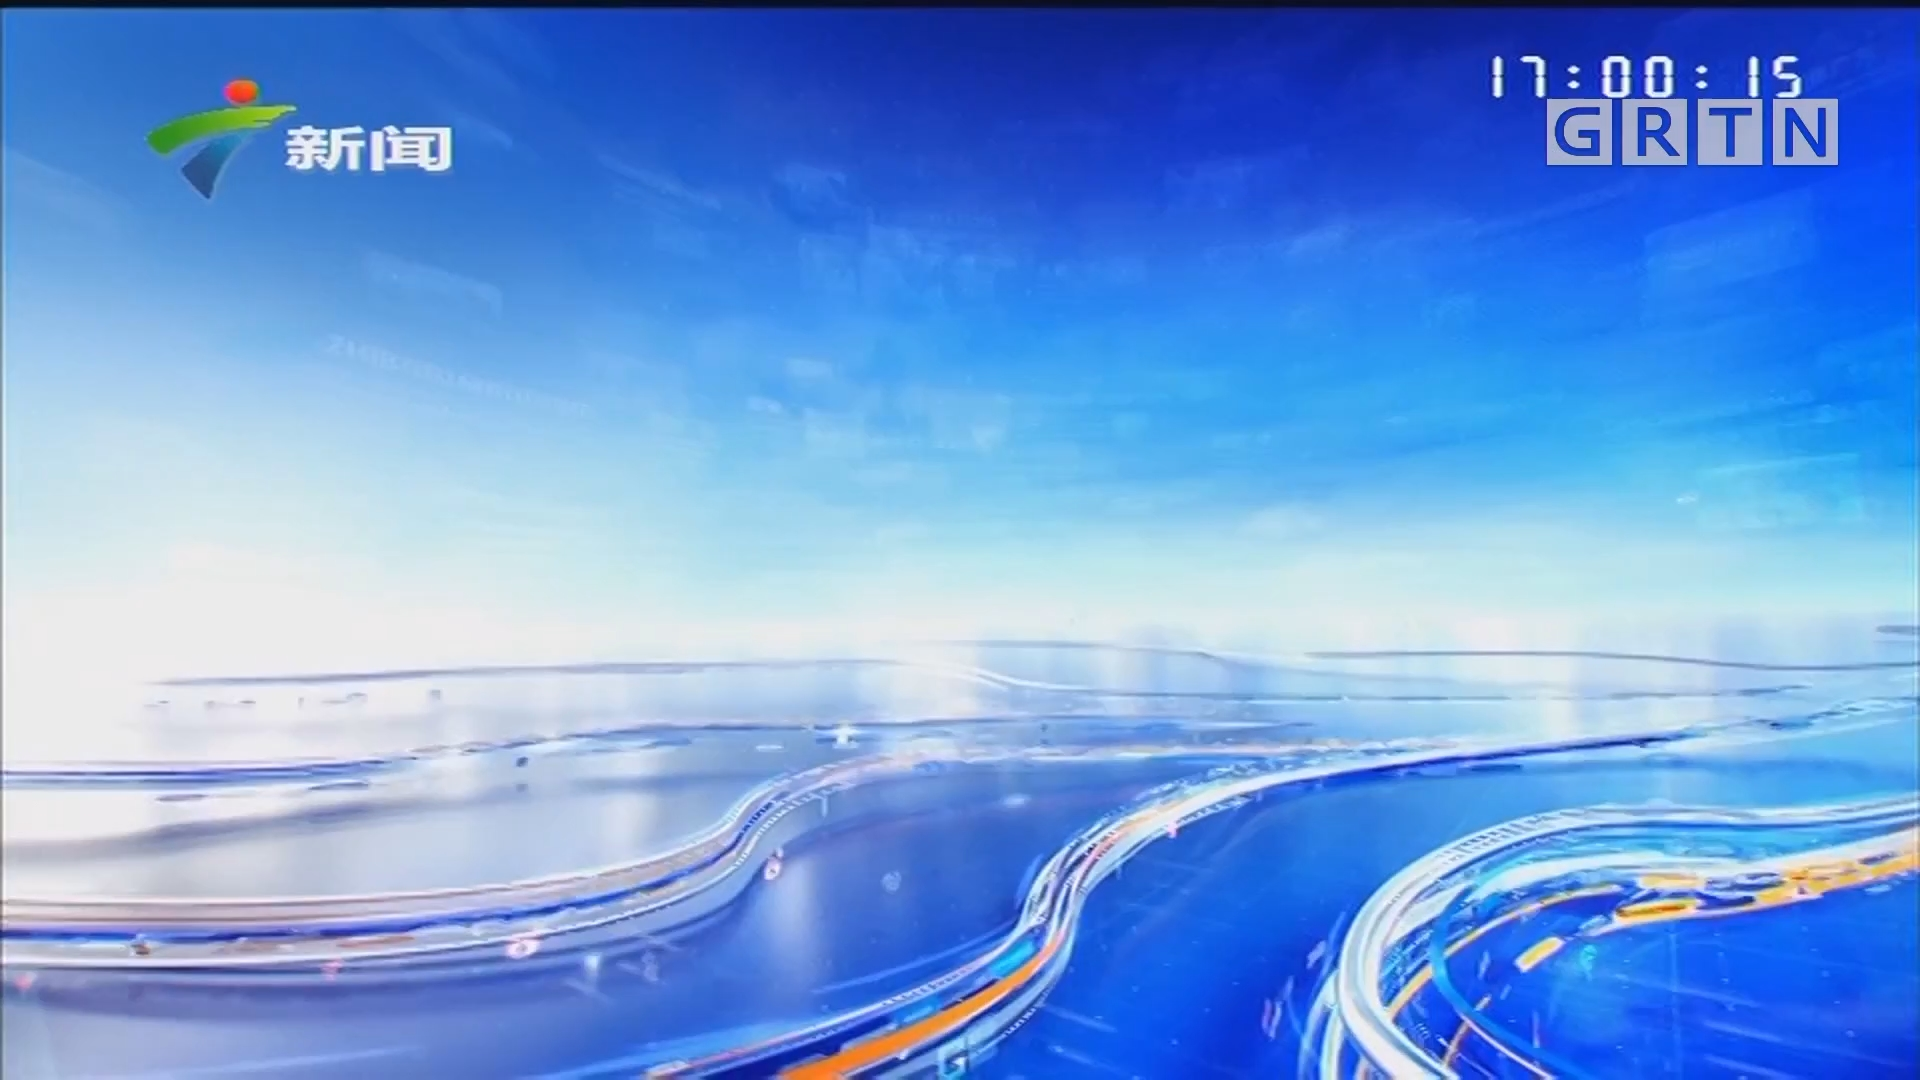 [HD][2019-05-30]直播广东:广东:今明降水减弱 局部雨势仍较大、